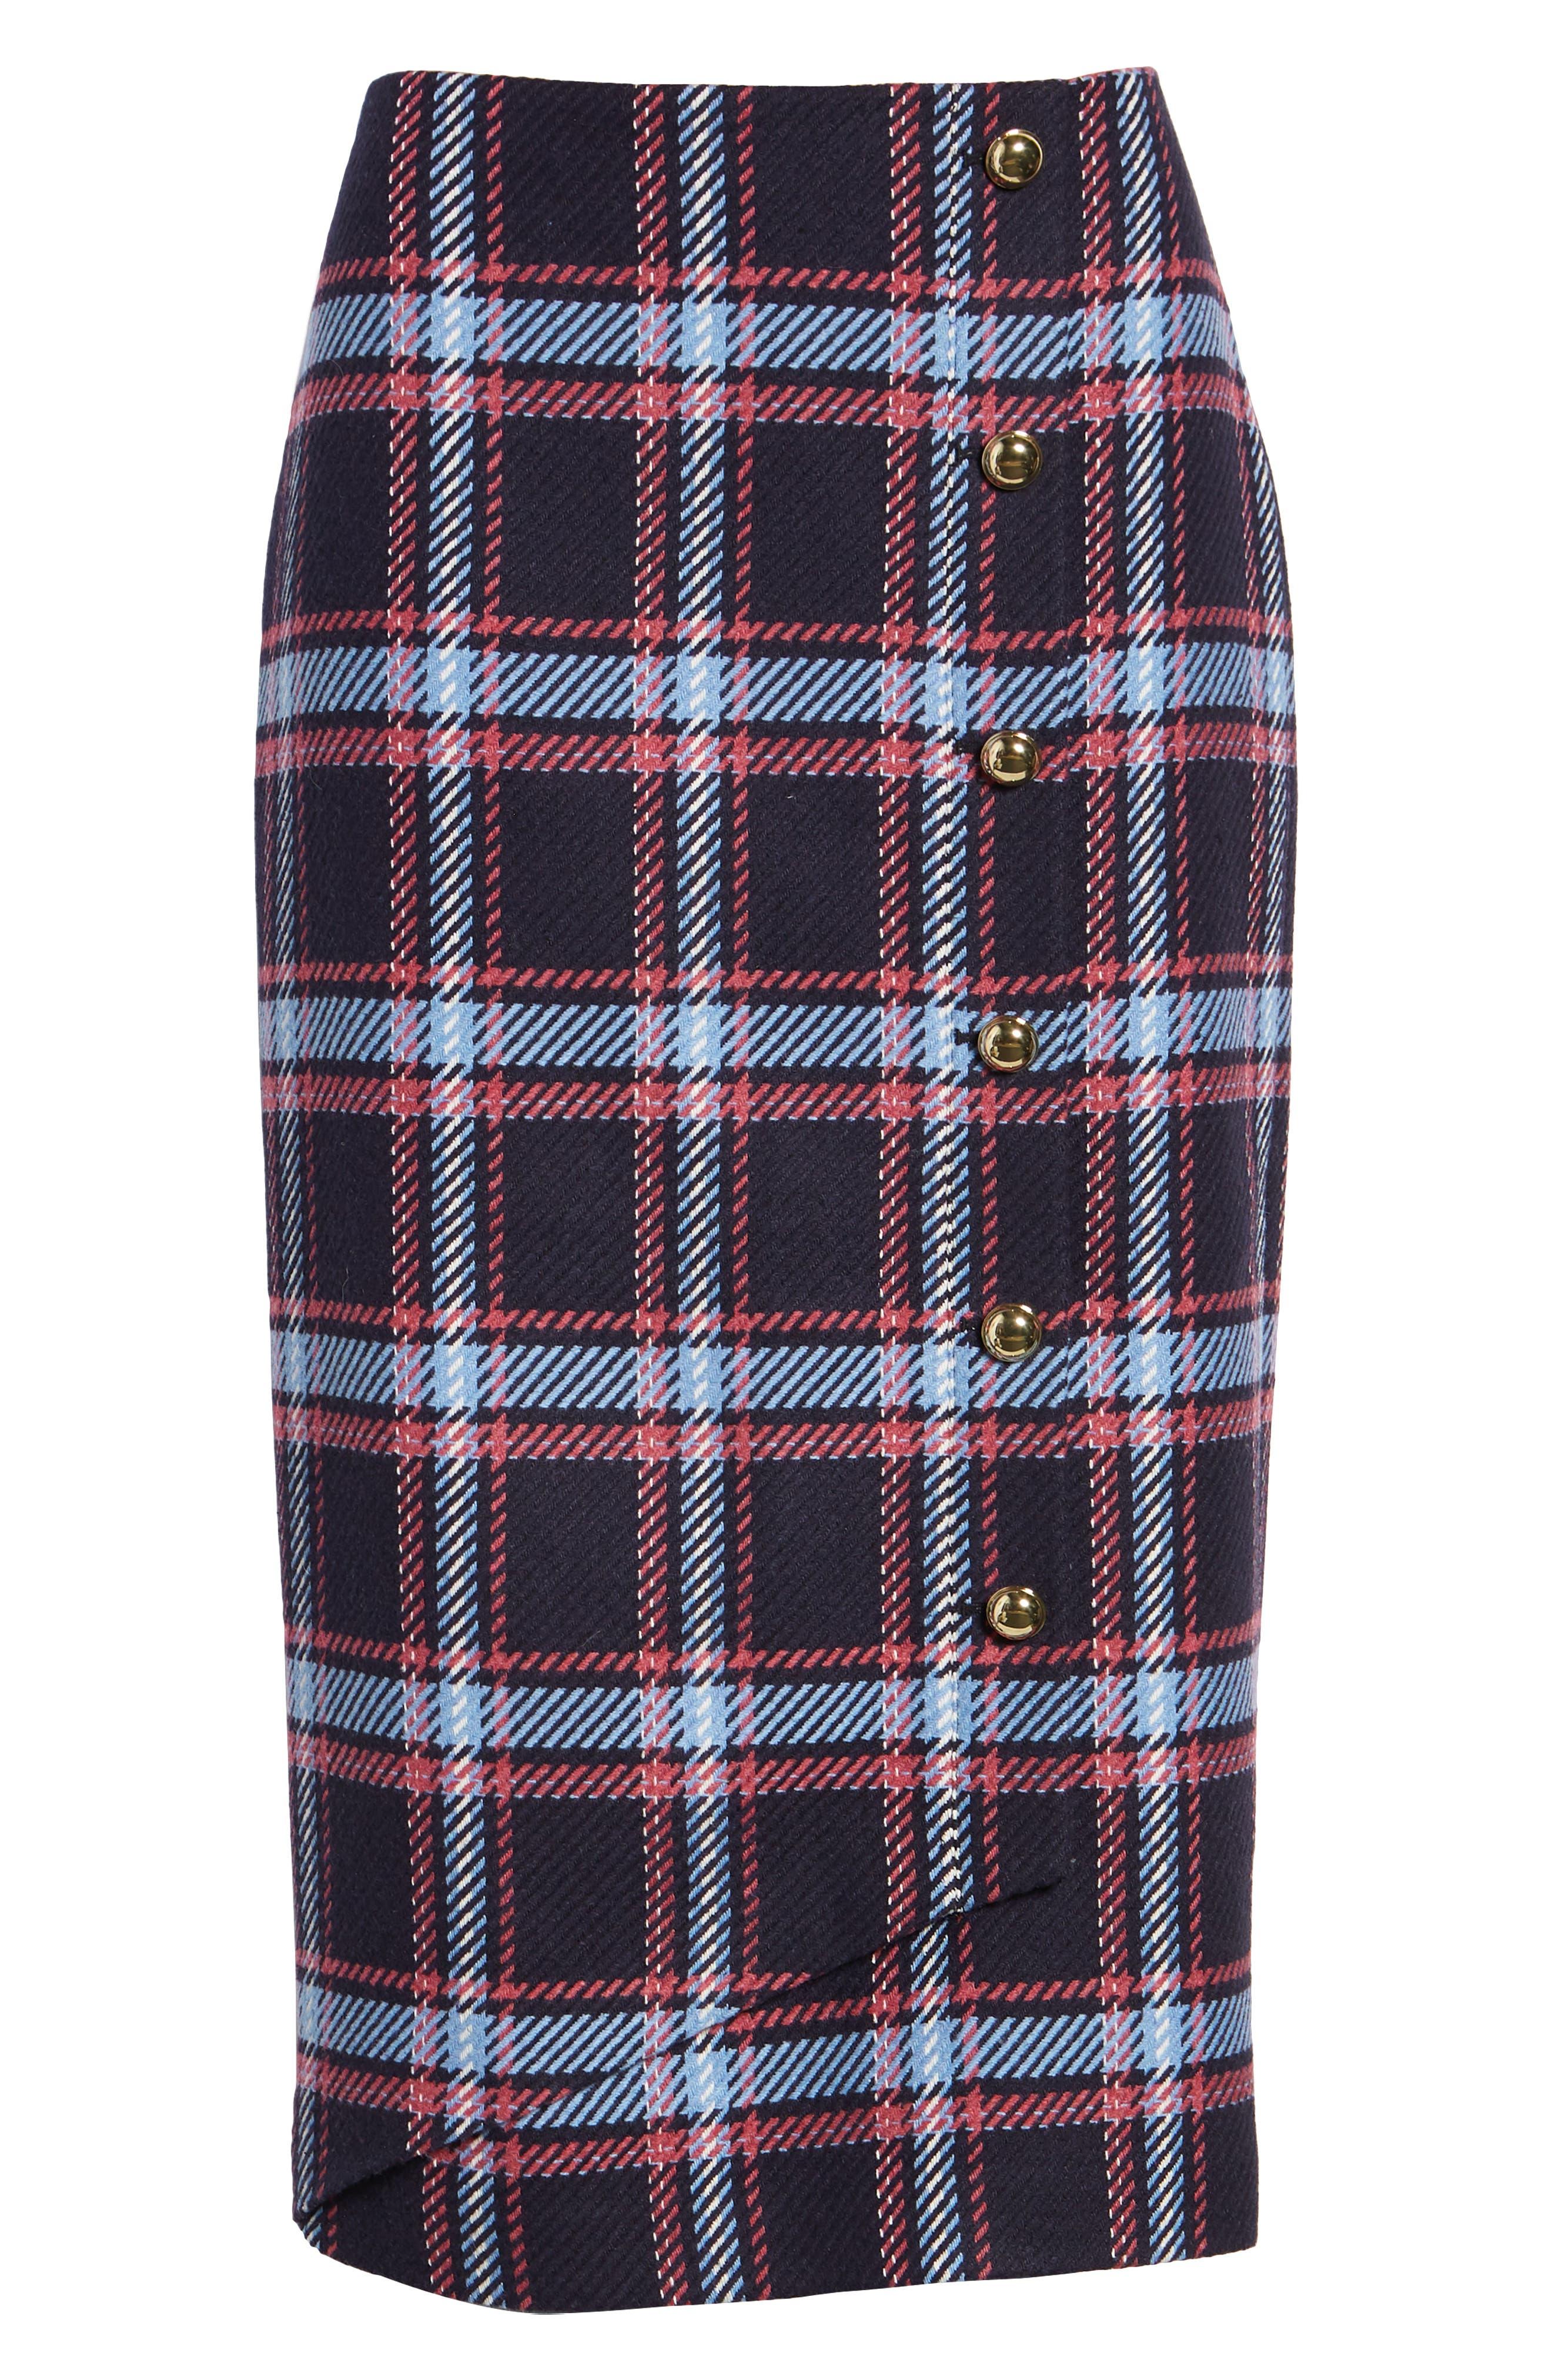 x Atlantic-Pacific Plaid Wrap Pencil Skirt,                             Alternate thumbnail 6, color,                             NAVY PLAID